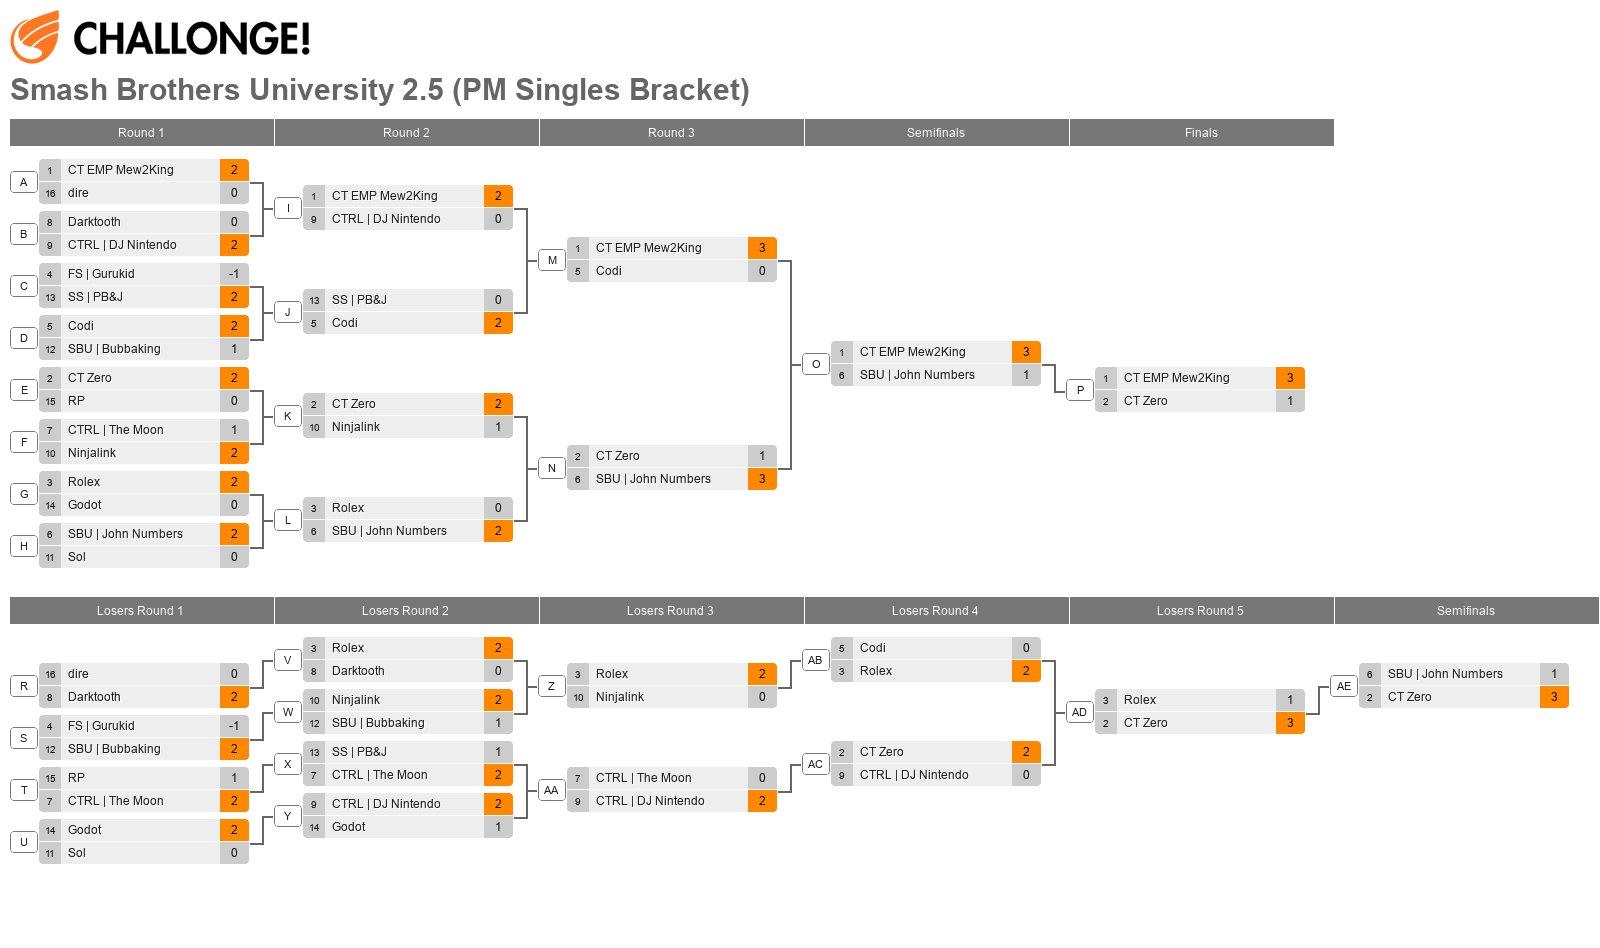 Smash Brothers University 2.5 (PM Singles Bracket)